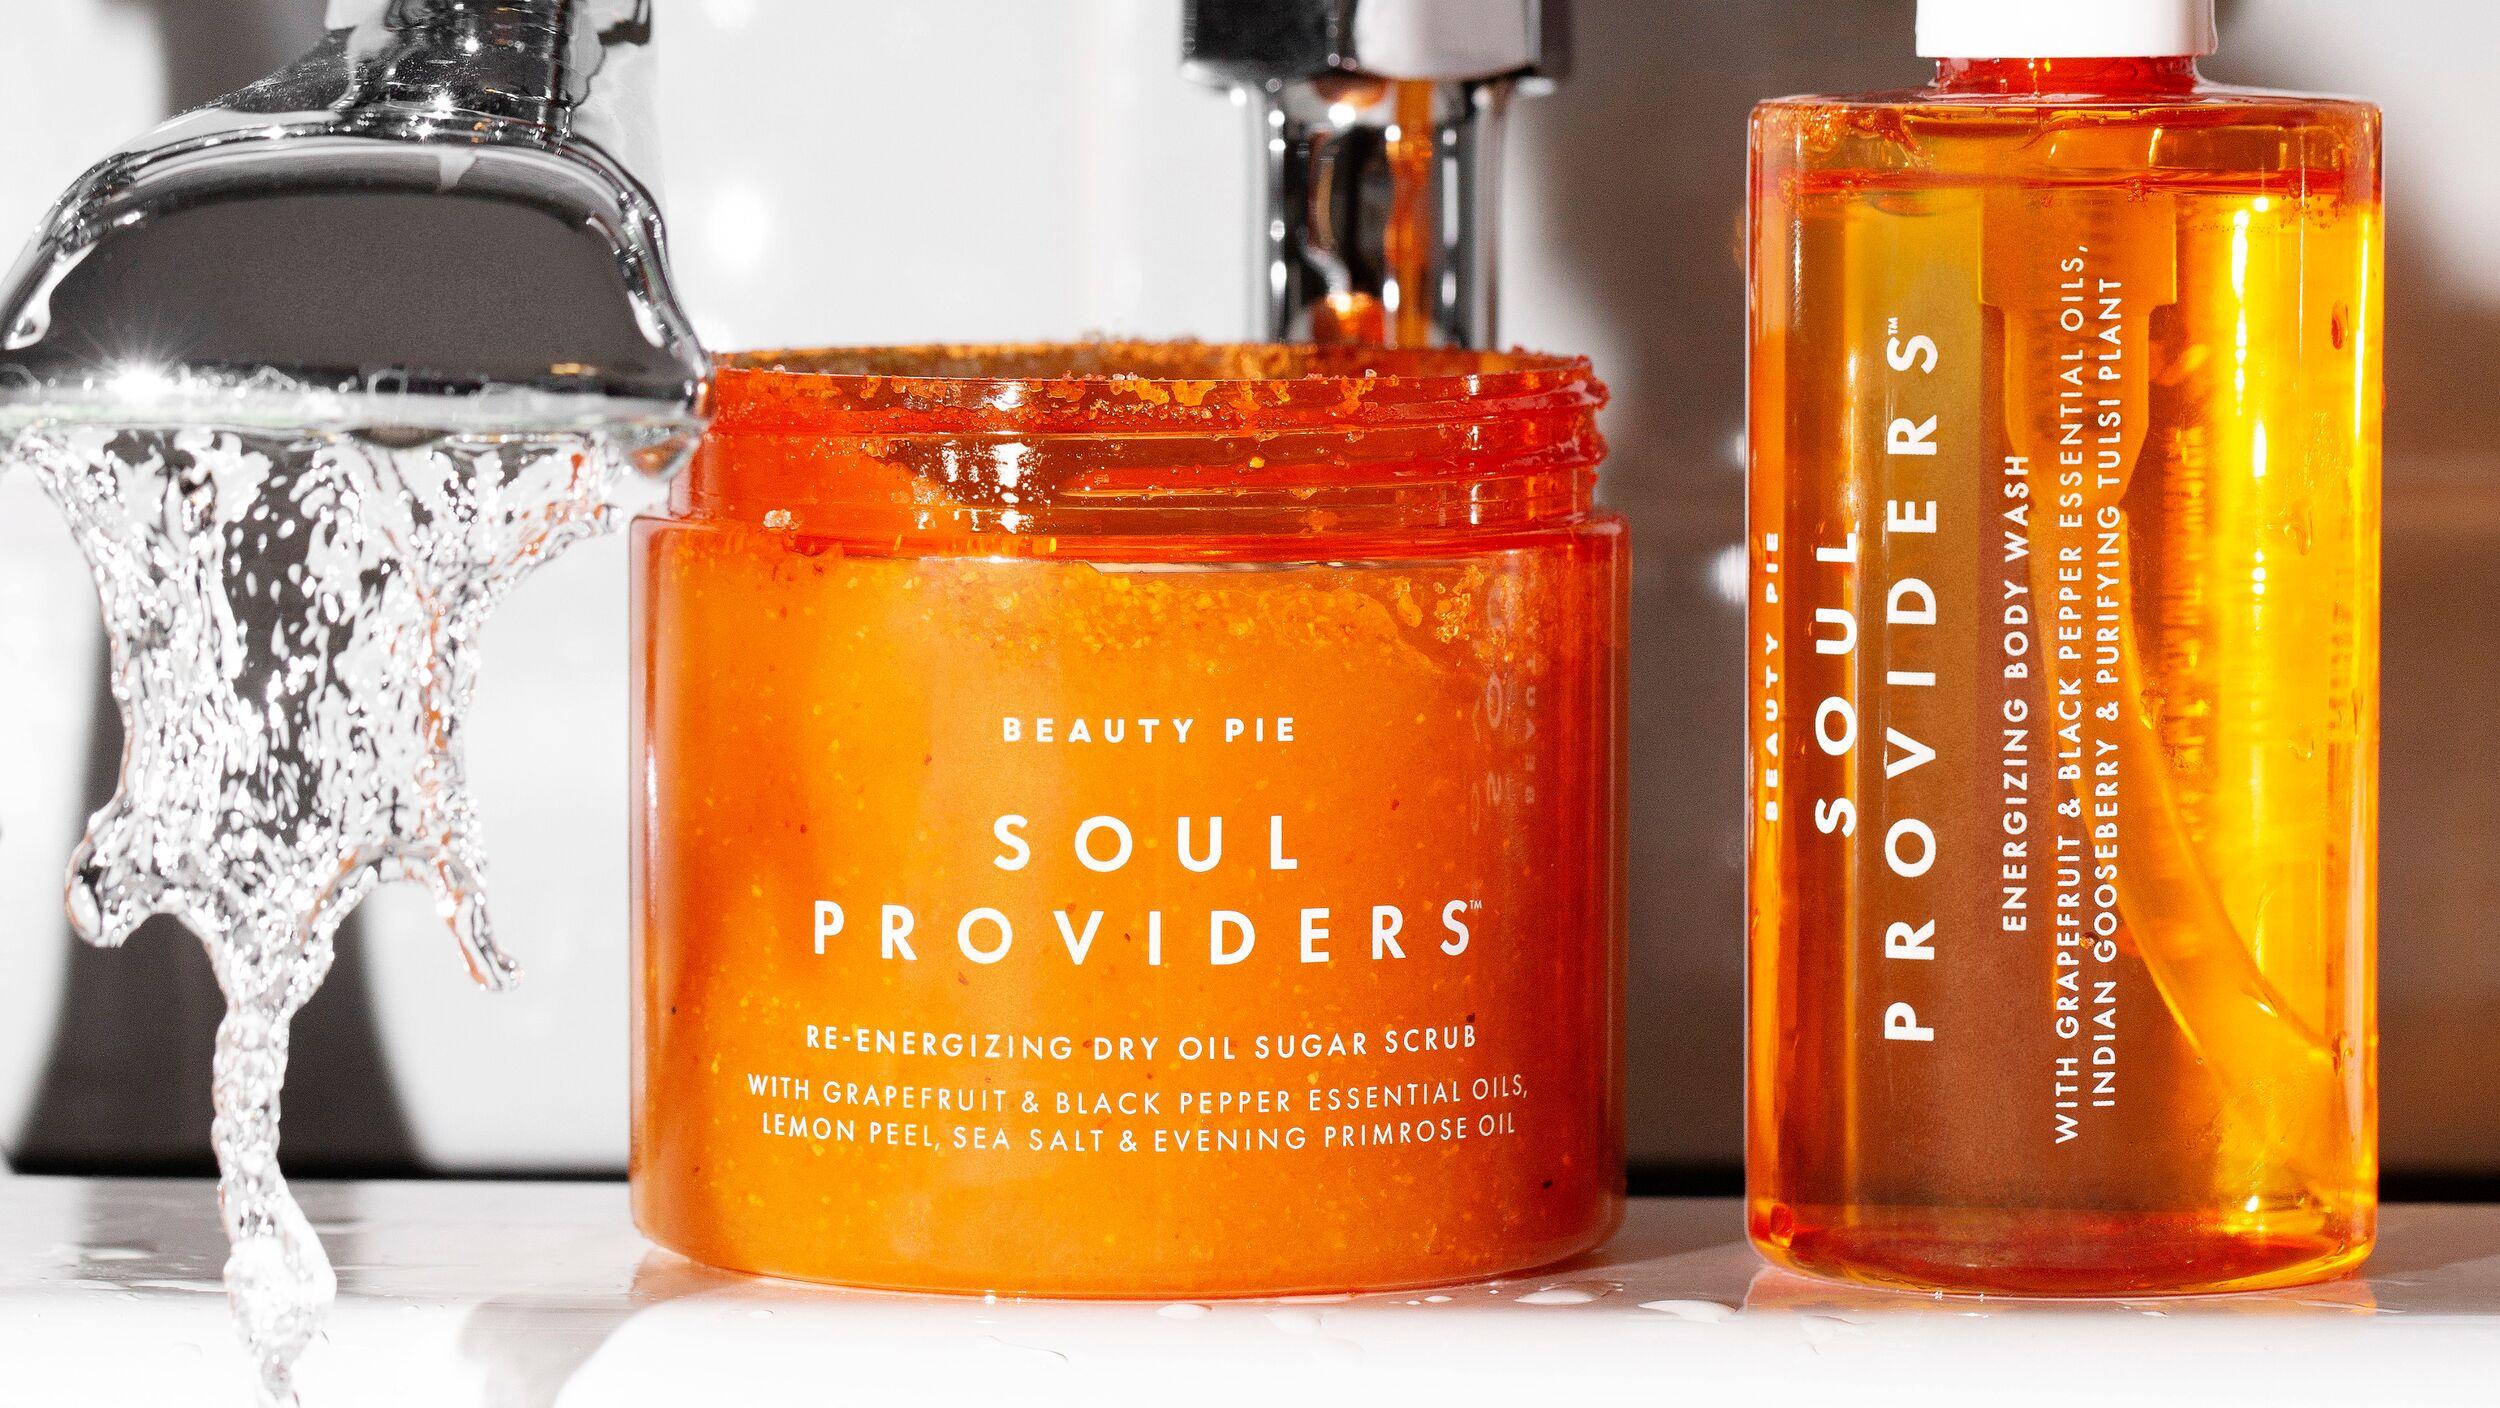 Soul Providers Scrub and Body Wash